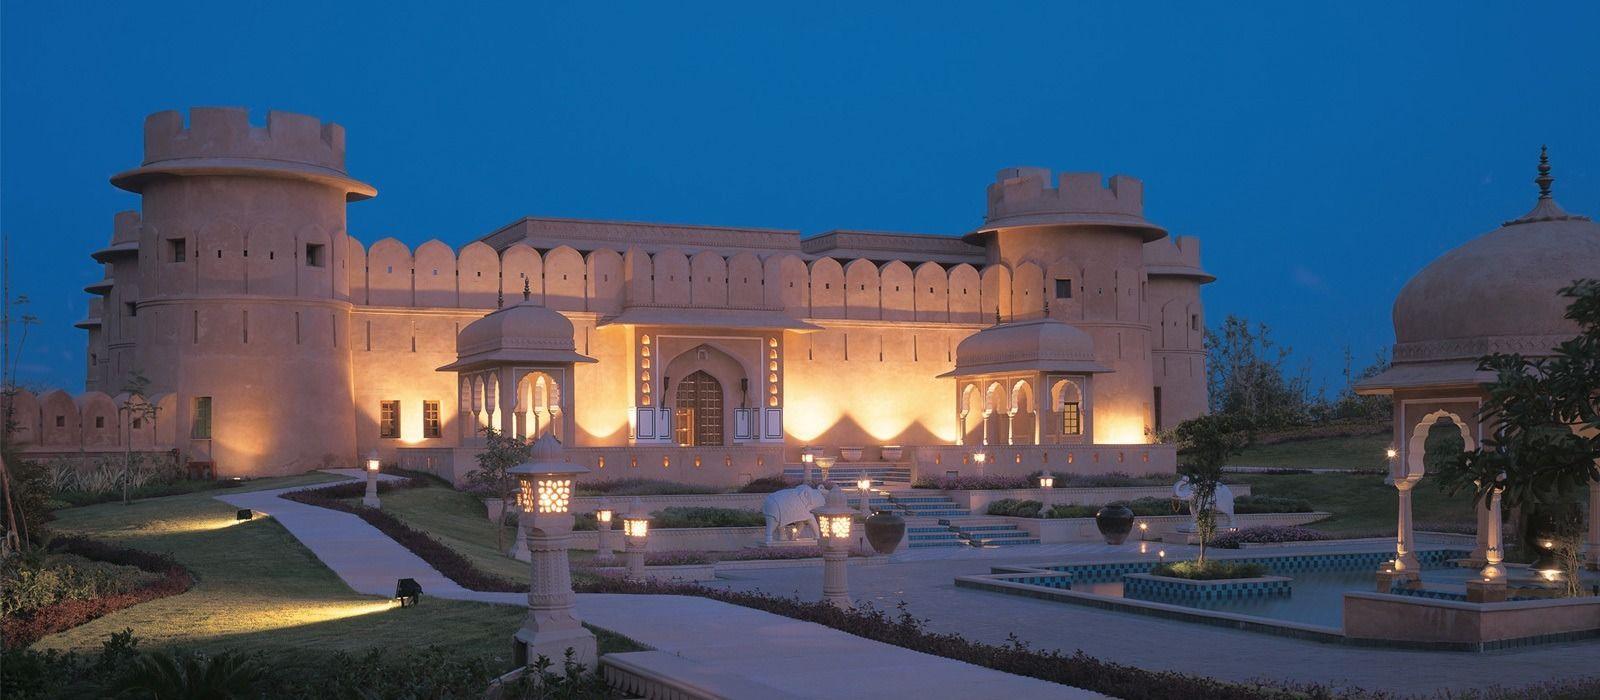 Oberoi Exklusiv: Royales Rajasthan und Safari Abenteuer Urlaub 3